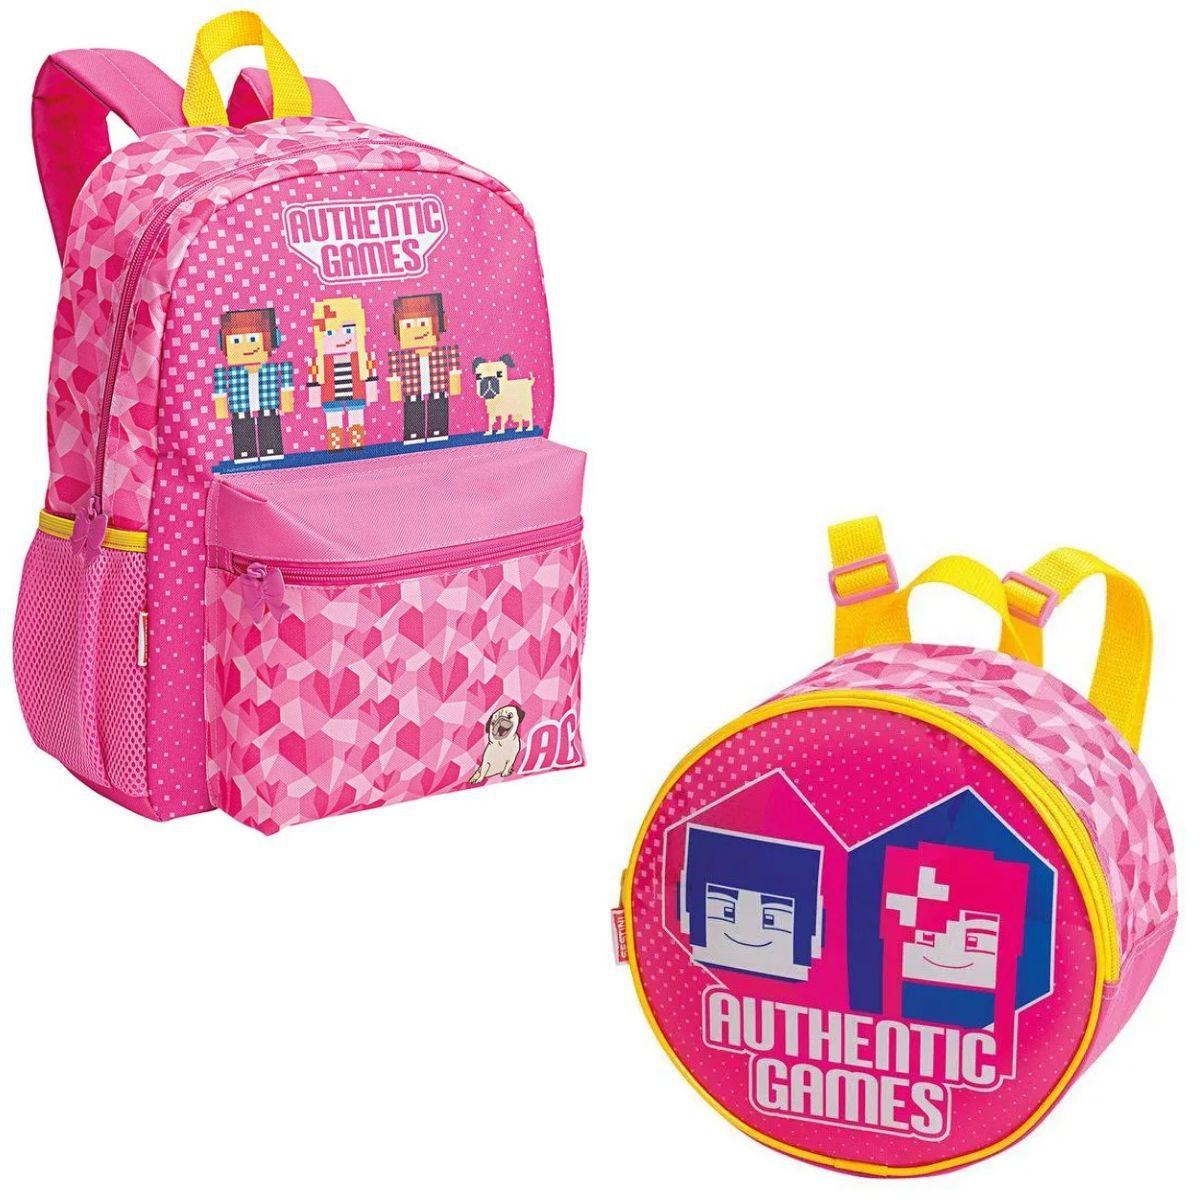 Kit Mochila Infantil Escolar Feminina Authentic Games Rosa Com Lancheira Sestini + 065575-00 + 065576-00